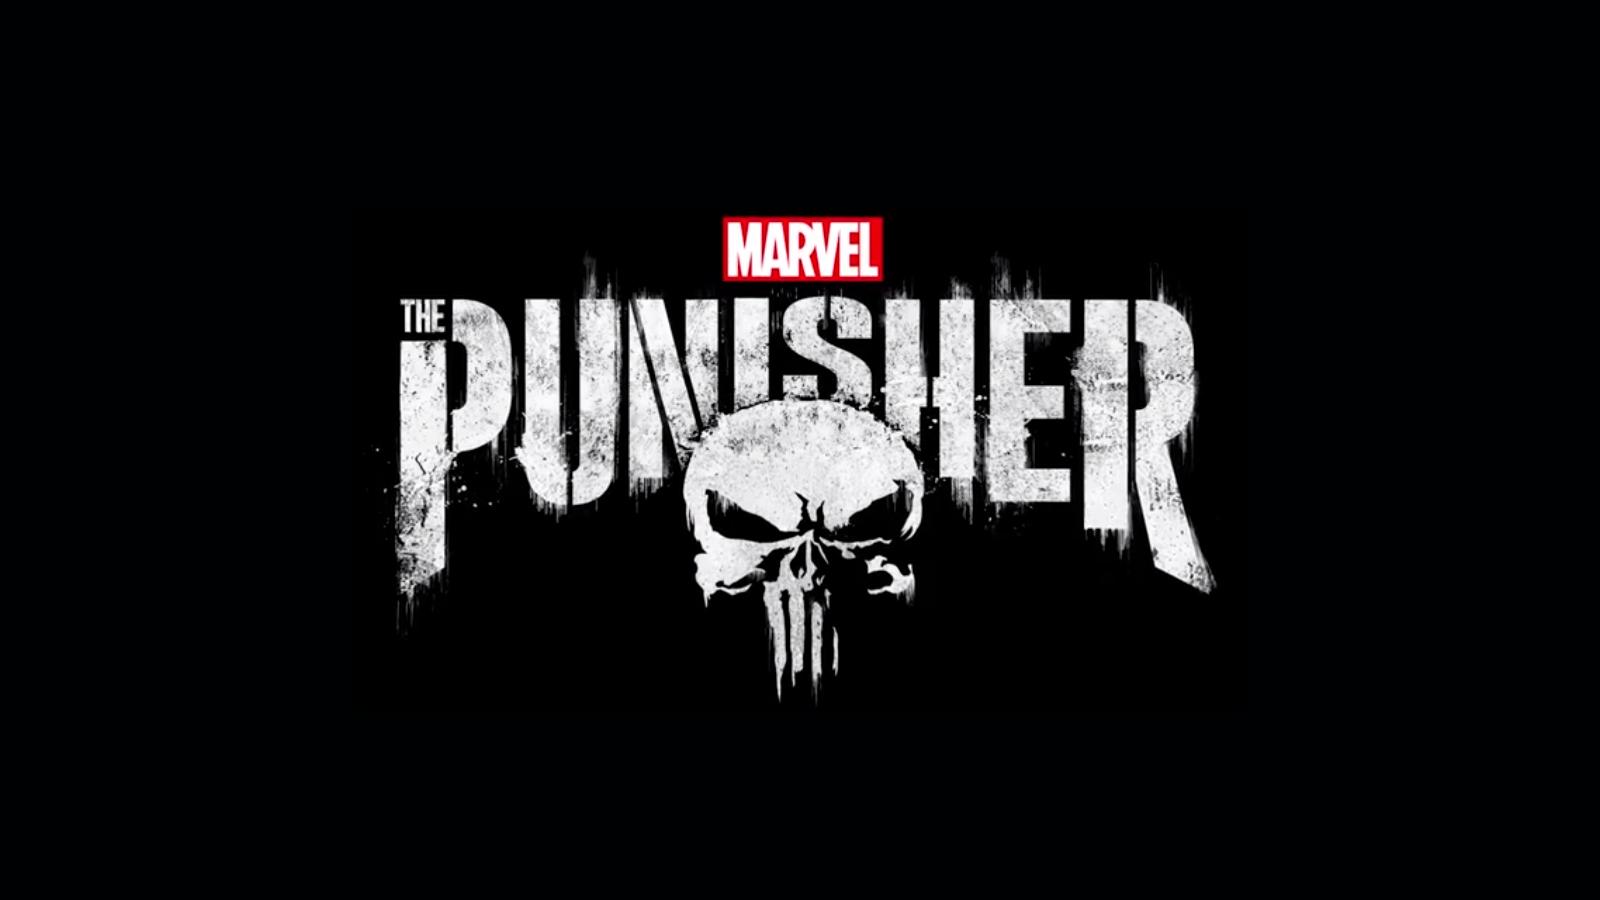 2017 07 22 Png 1 600 900 Pixels Punisher Skull Logo Punisher Skull Punisher